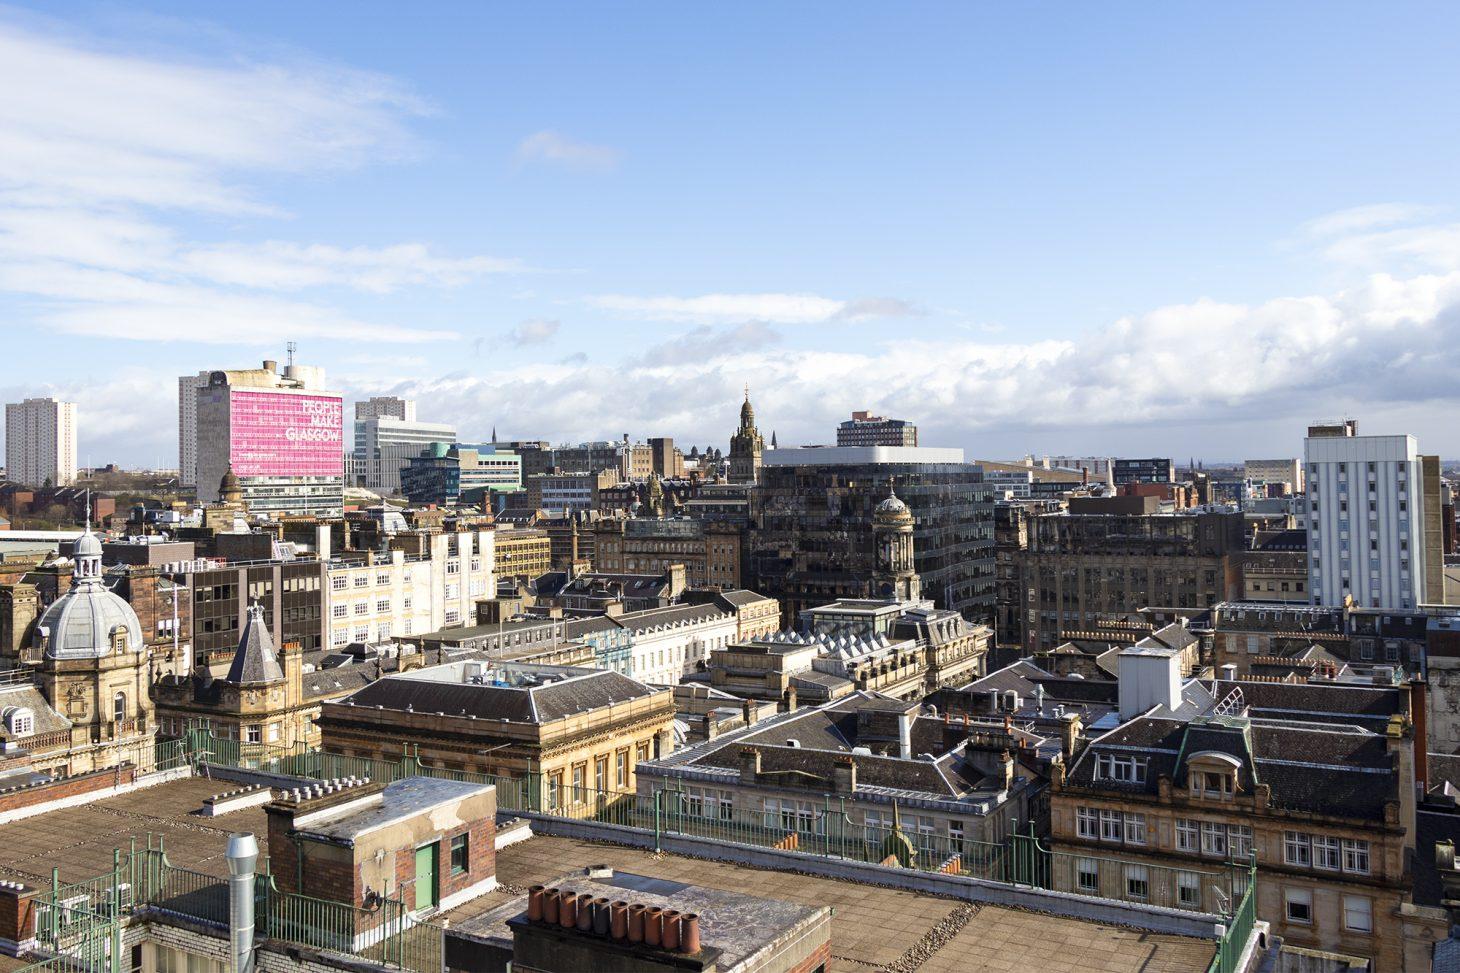 Glasgow skyline from The Lighthouse